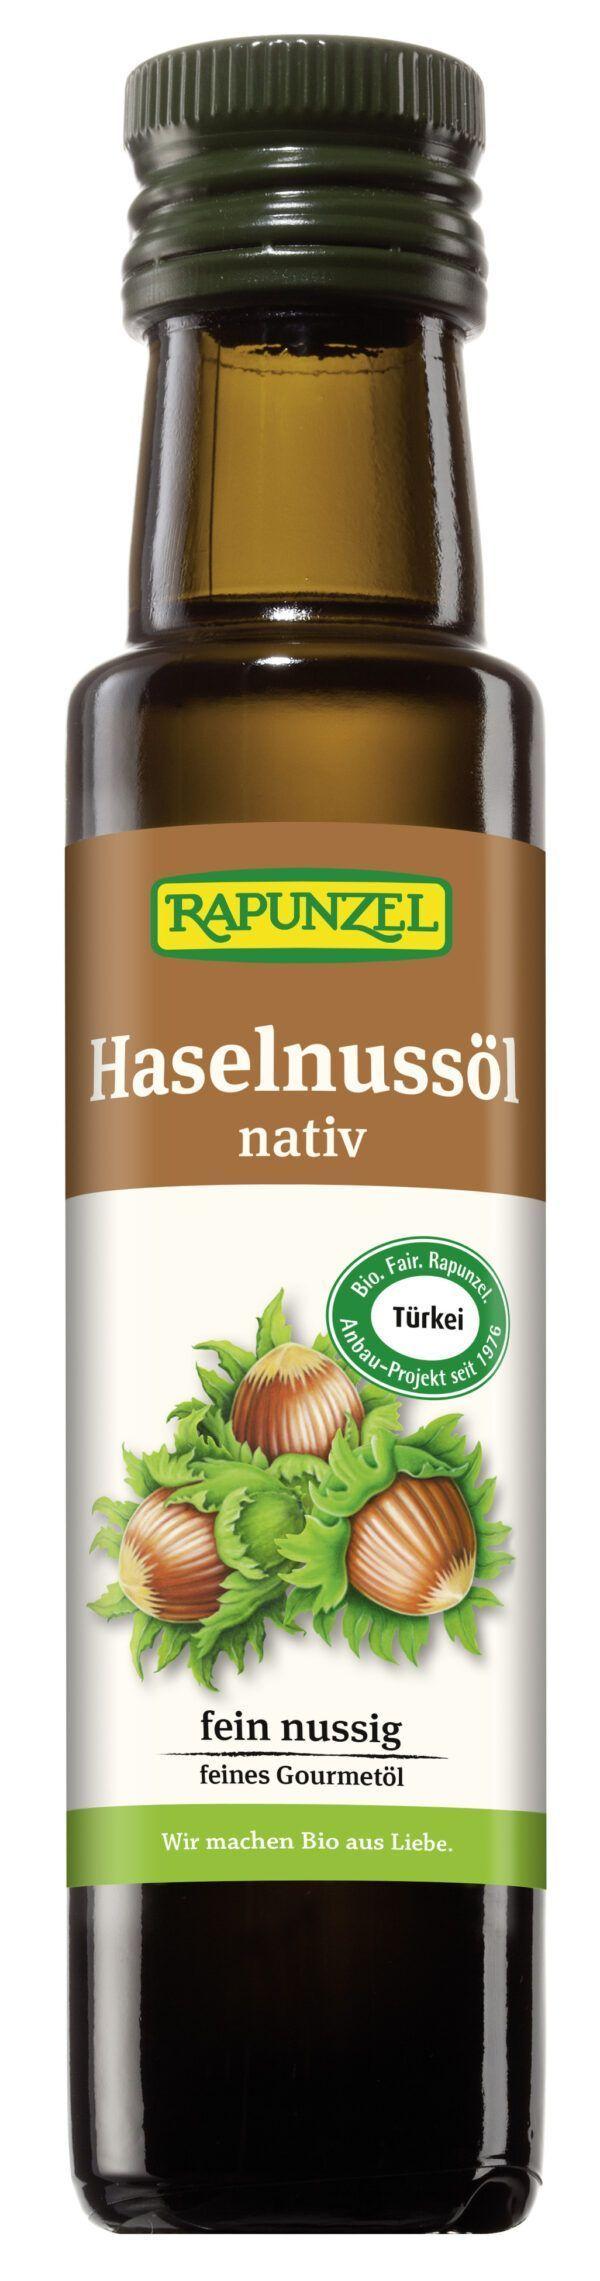 Rapunzel Haselnussöl nativ, Projekt 4x100ml